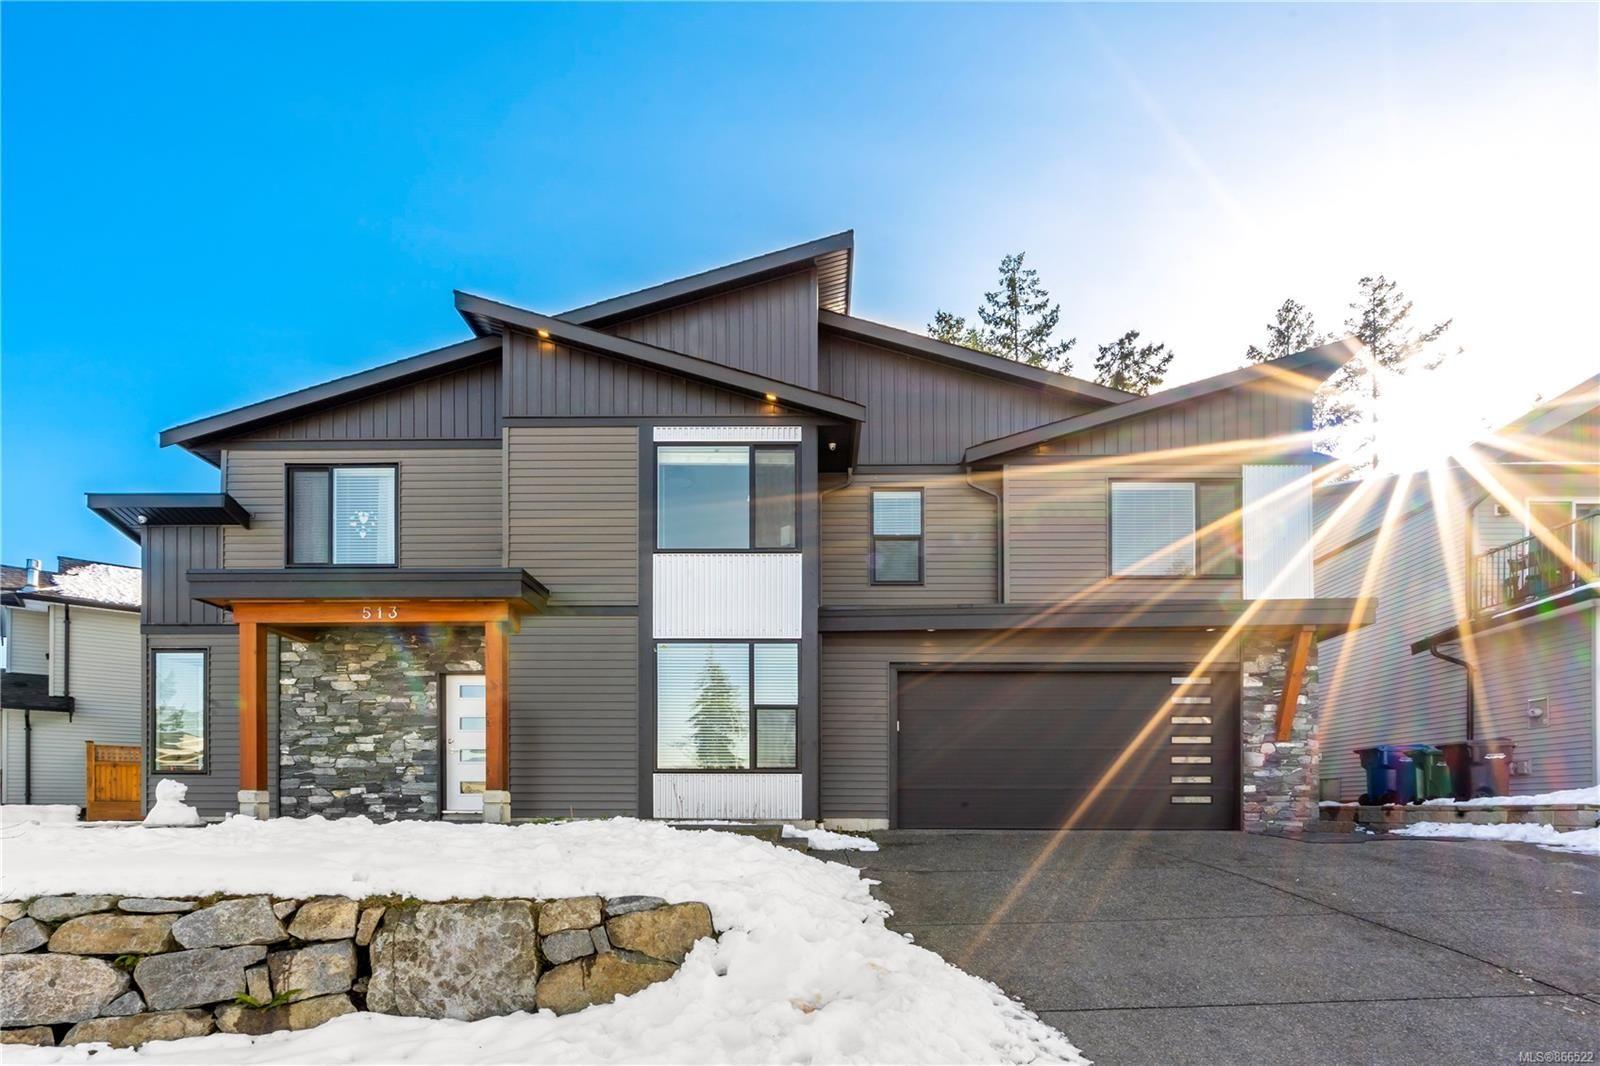 Main Photo: 513 Steeves Rd in : Na South Nanaimo House for sale (Nanaimo)  : MLS®# 866522